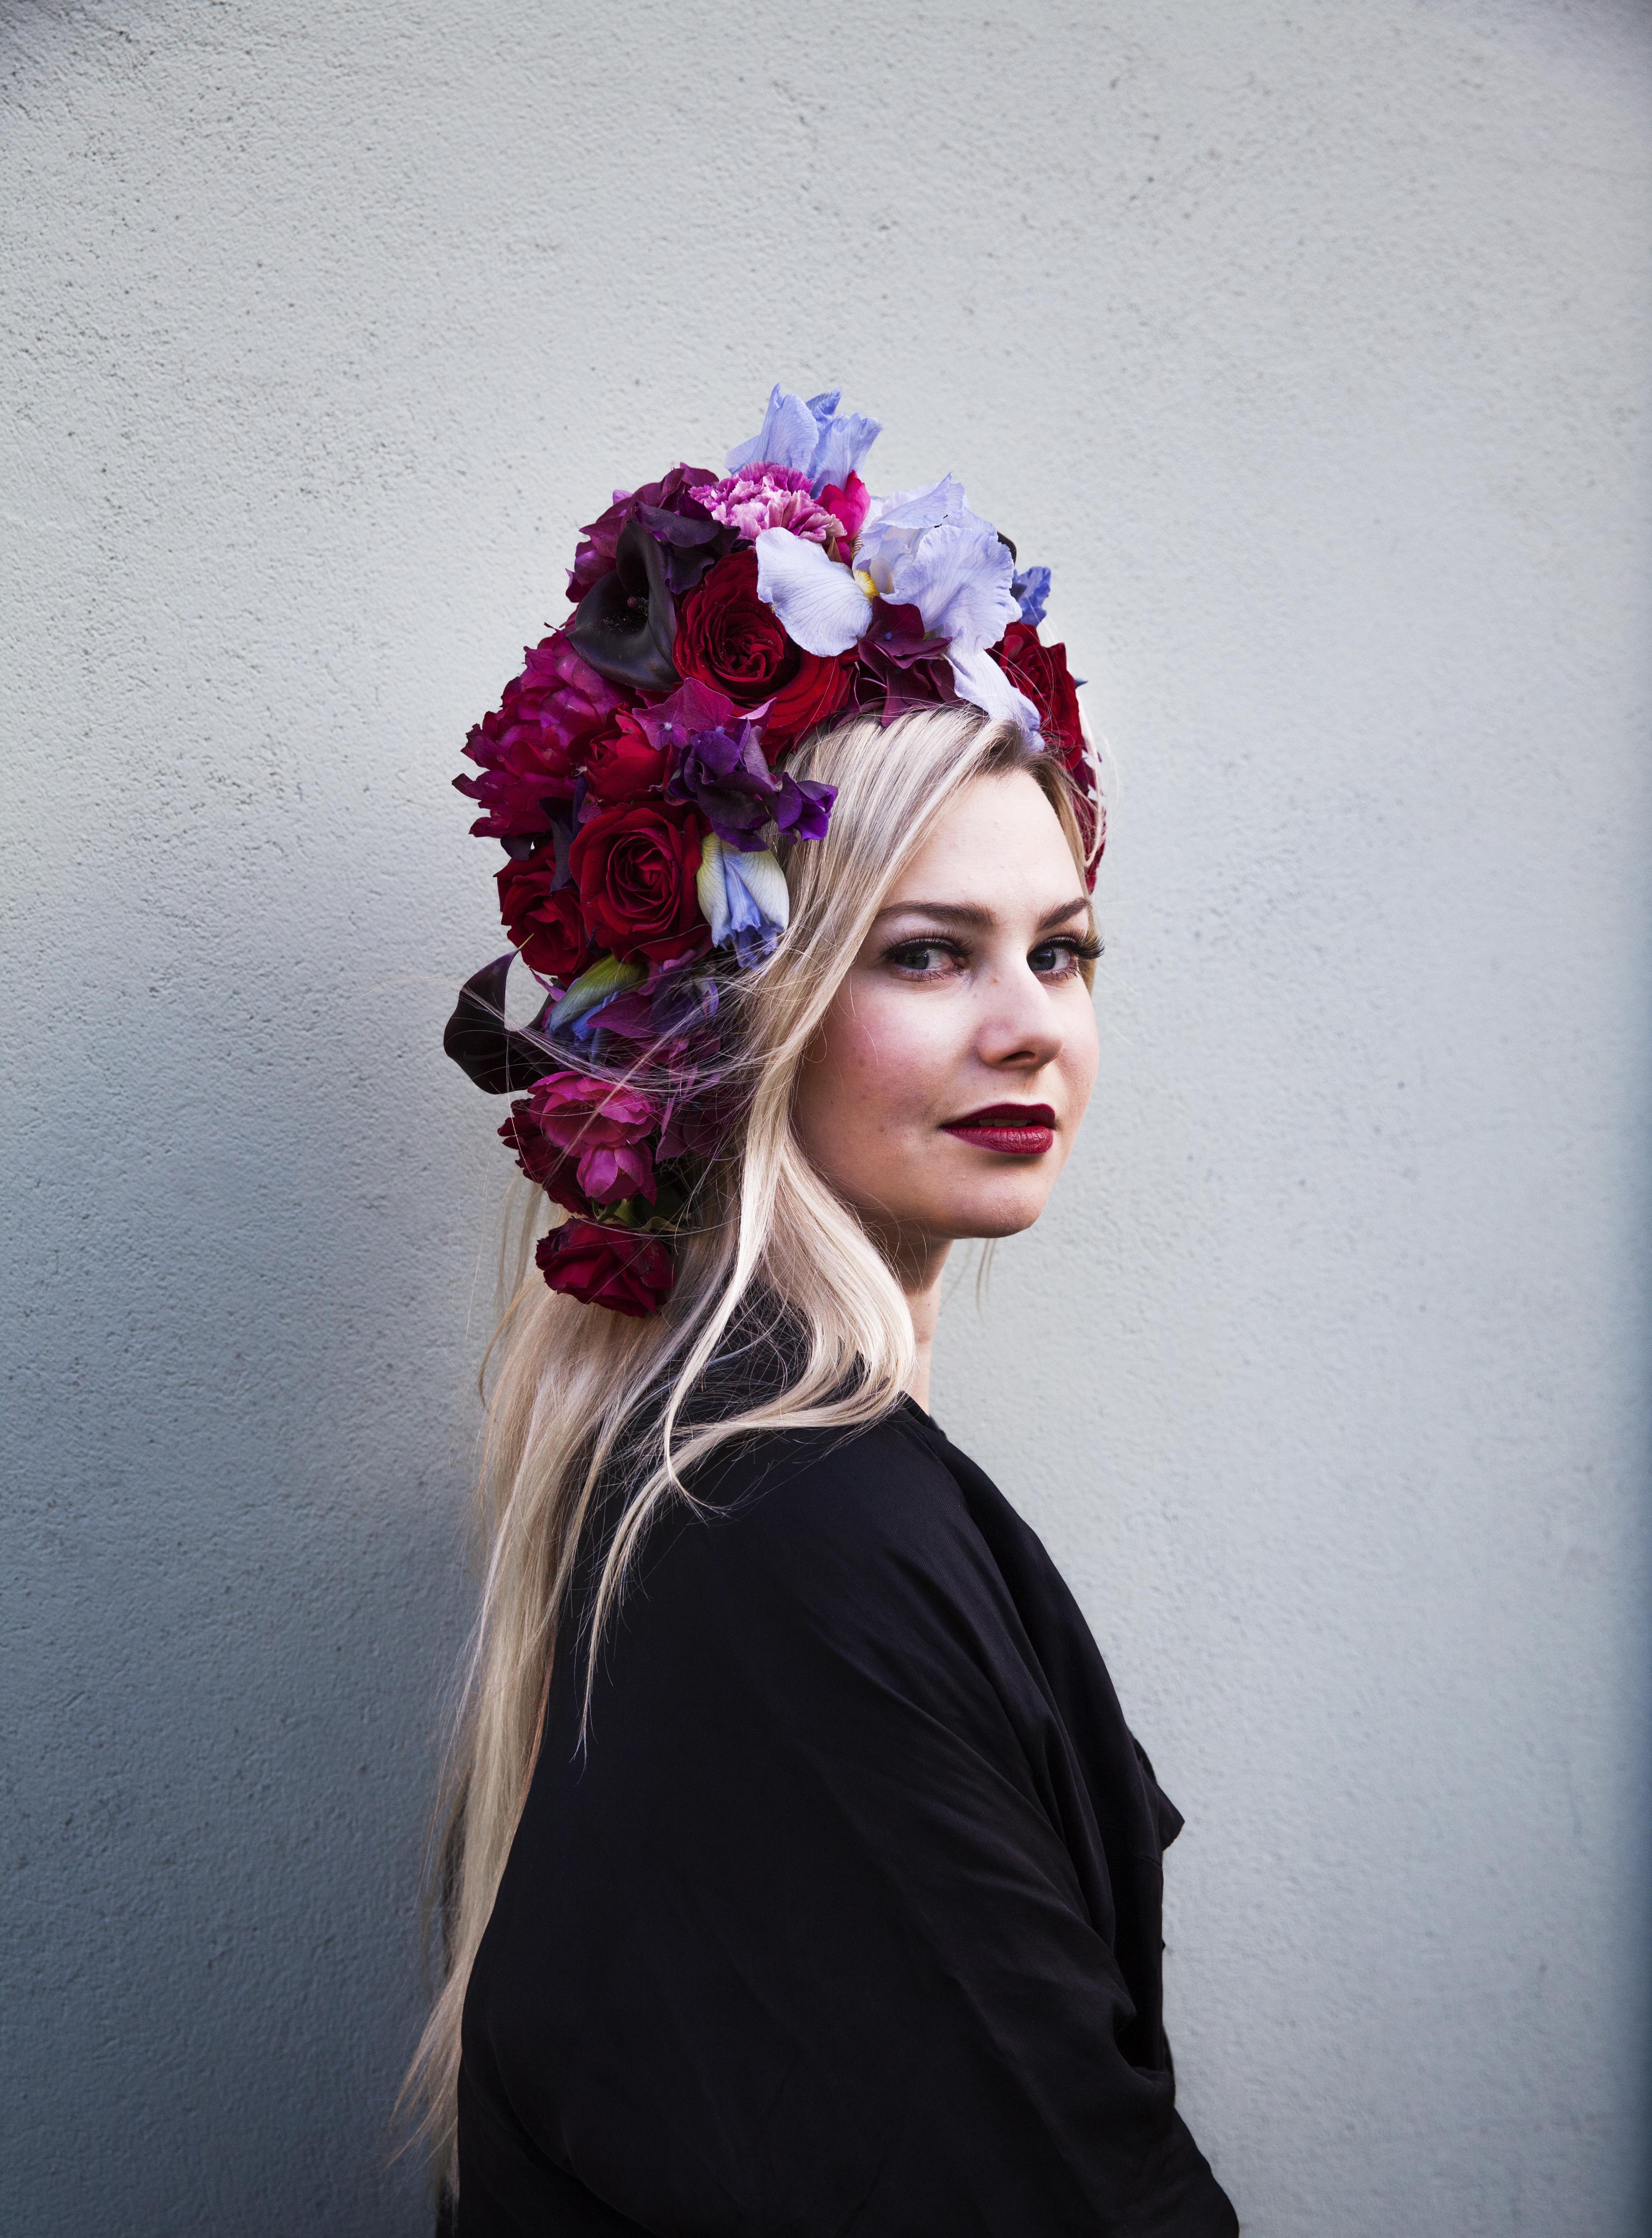 Kuva: Nadja Hallström